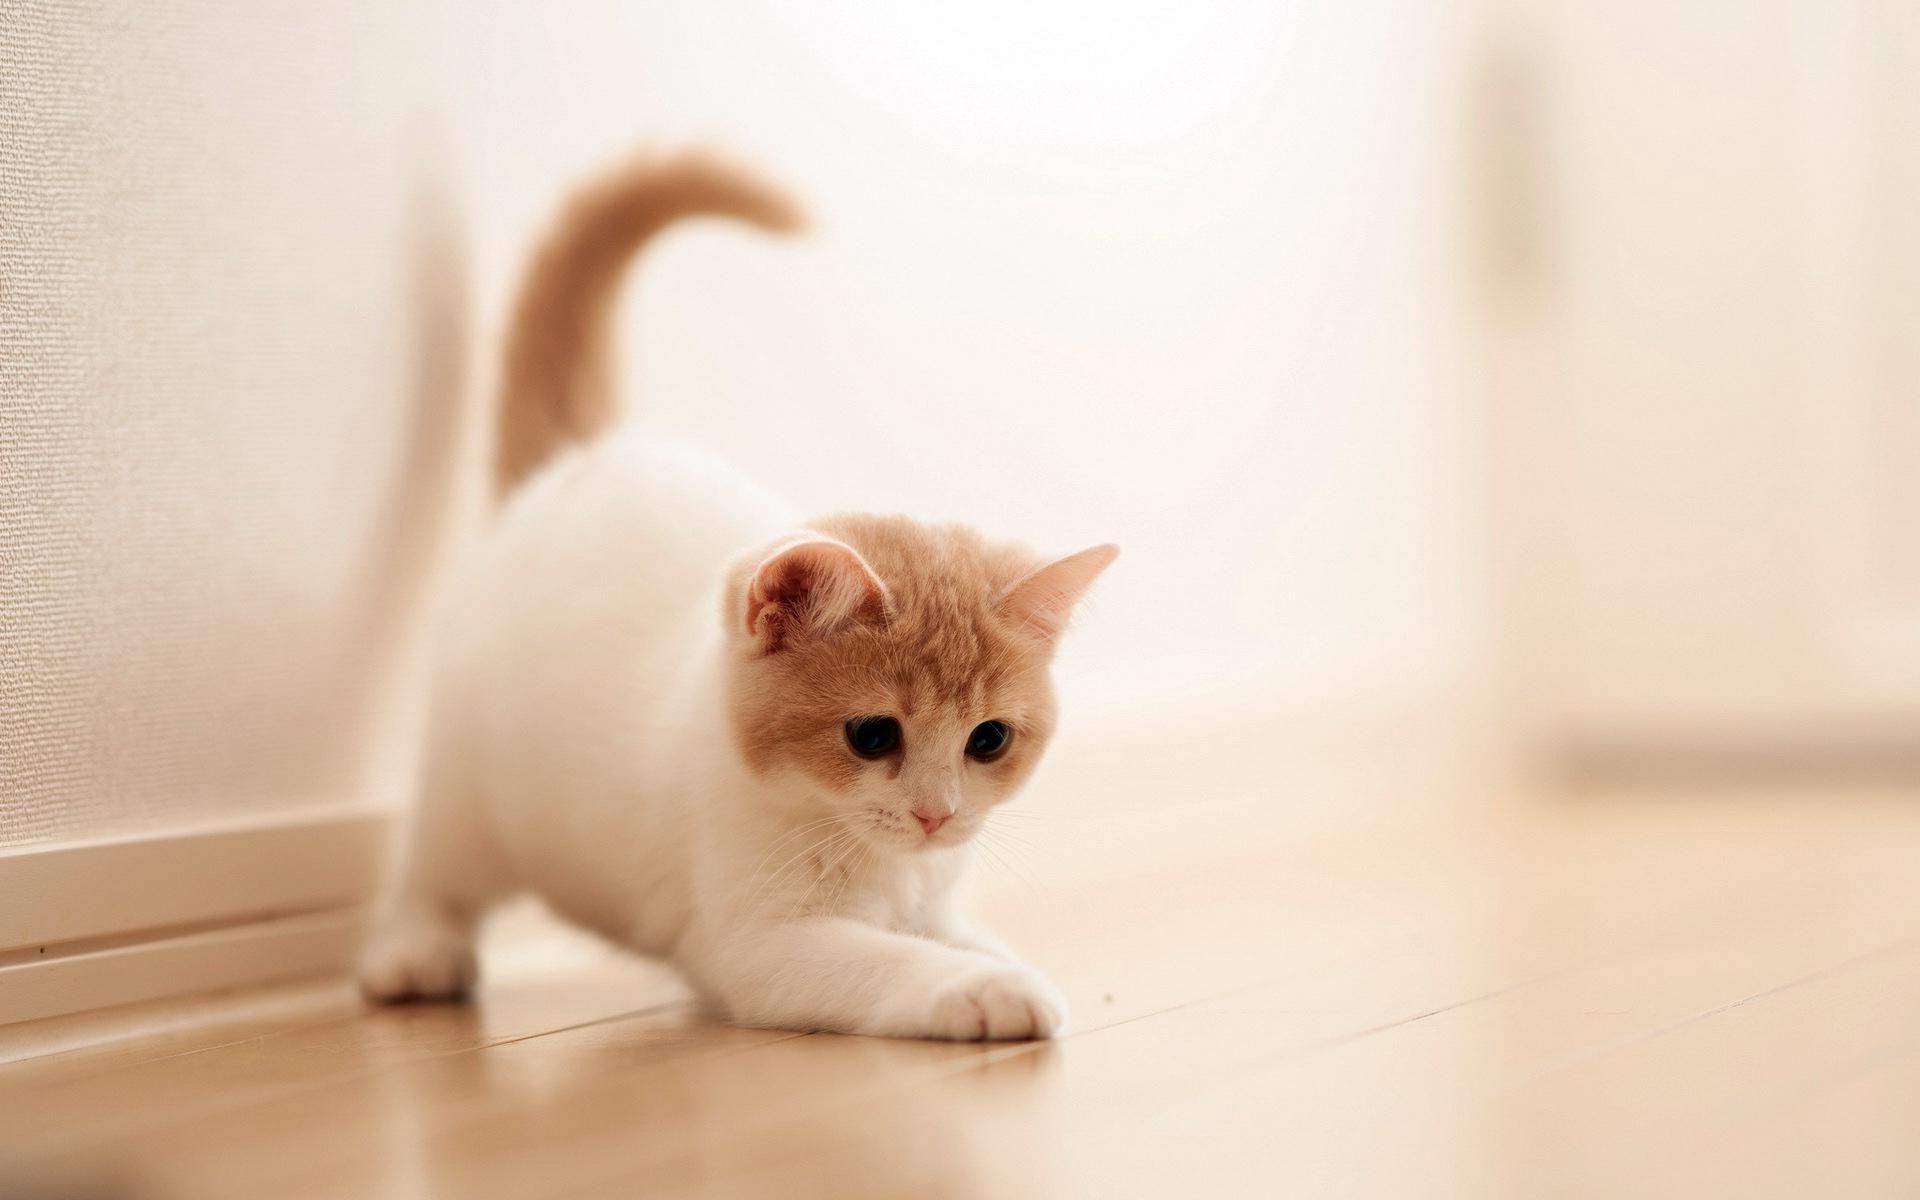 cute cat wallpaper youtube | hd wallpapers | pinterest | cat